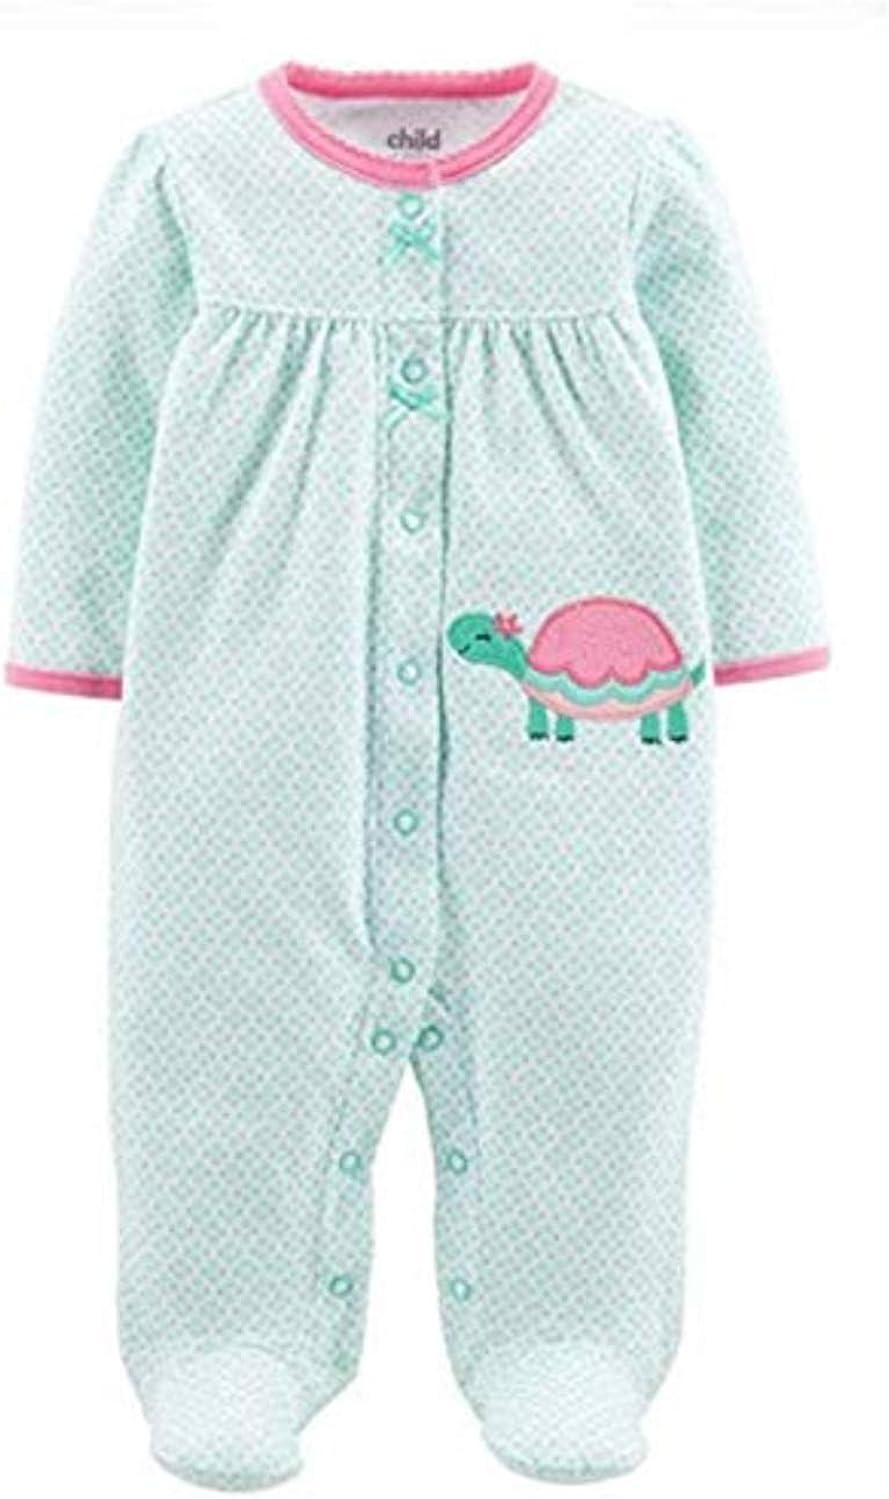 Carters Child of Mine Baby Girls Turtle Sleeper Sleep N Play Pajamas Green /…3-6 Months